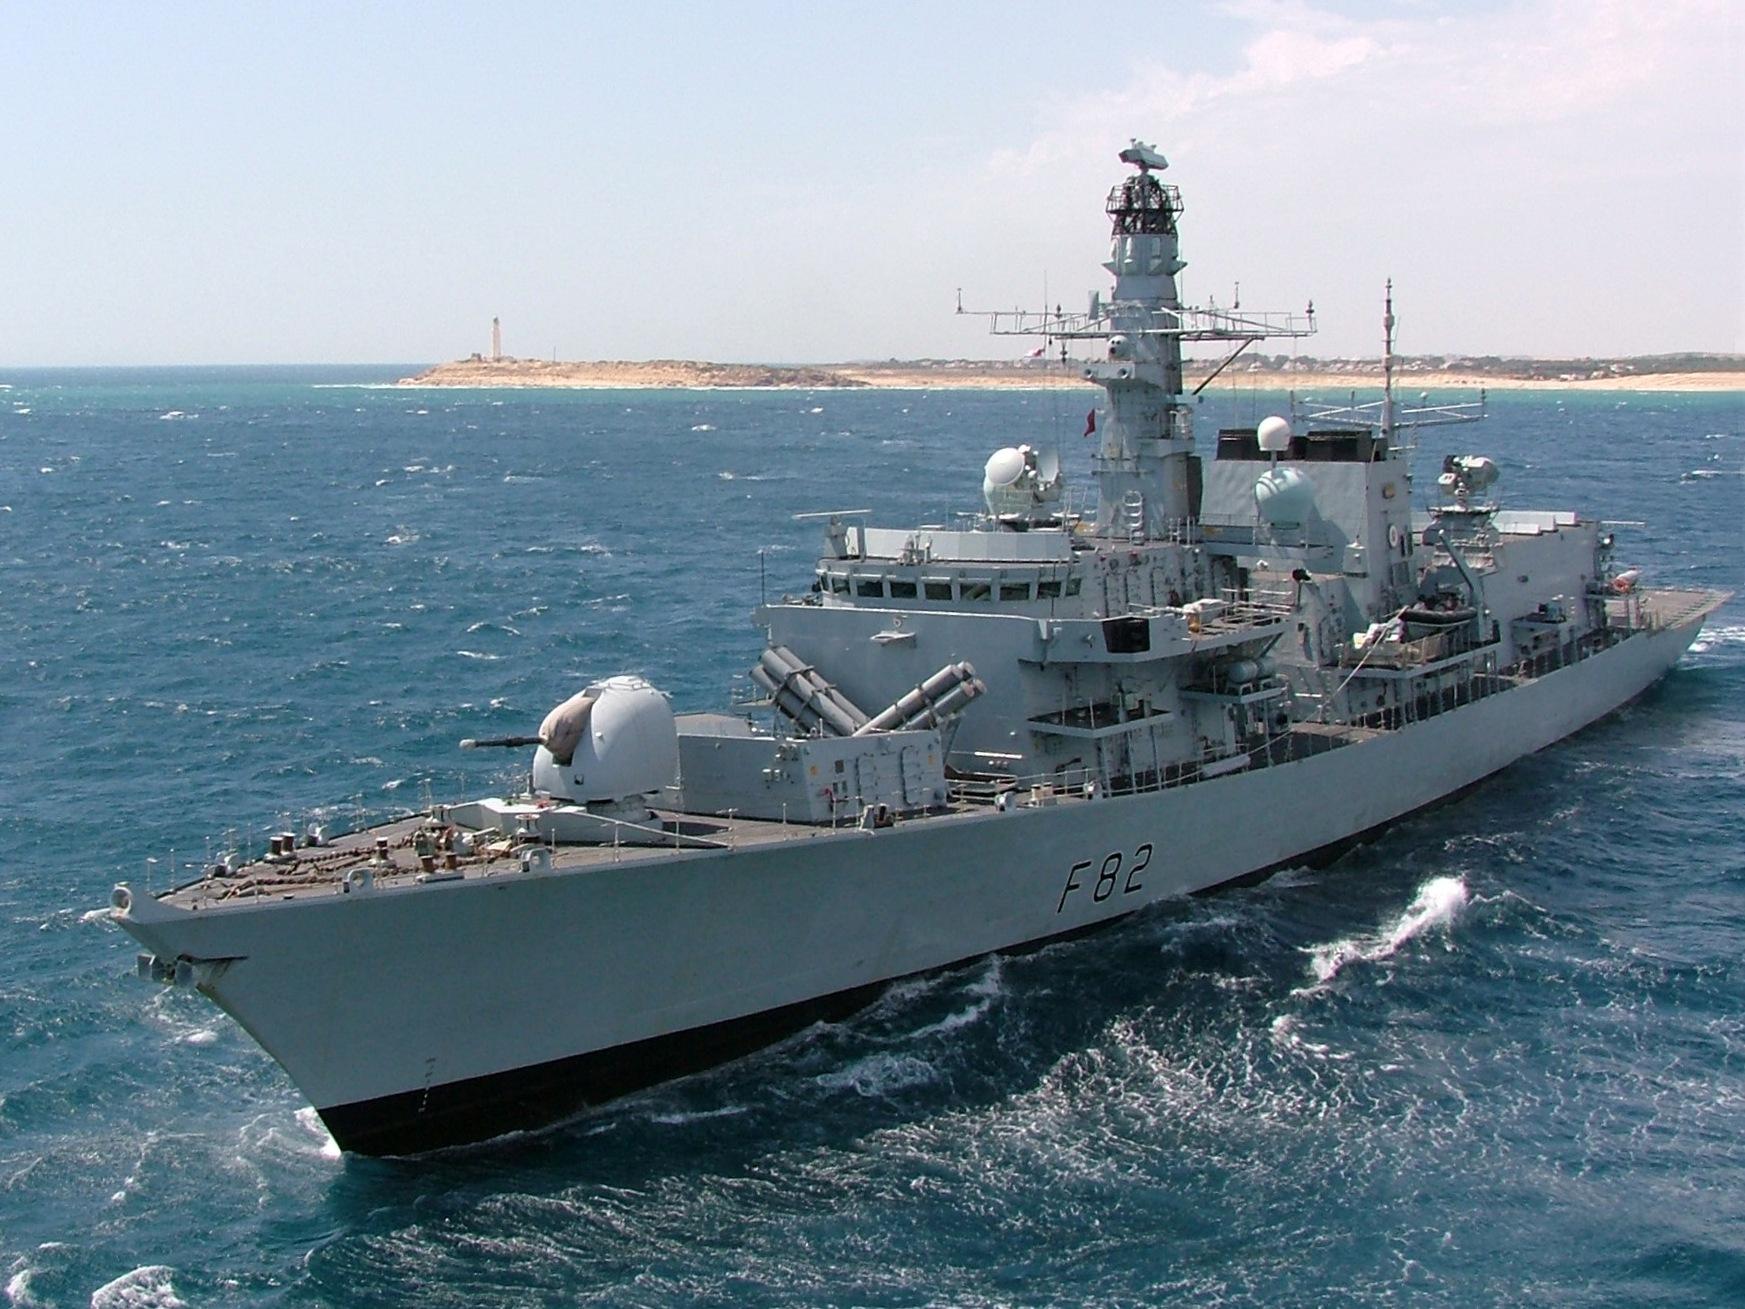 ����� ������ ������ ����� ������� HMS_Somerset_(F82).jpg